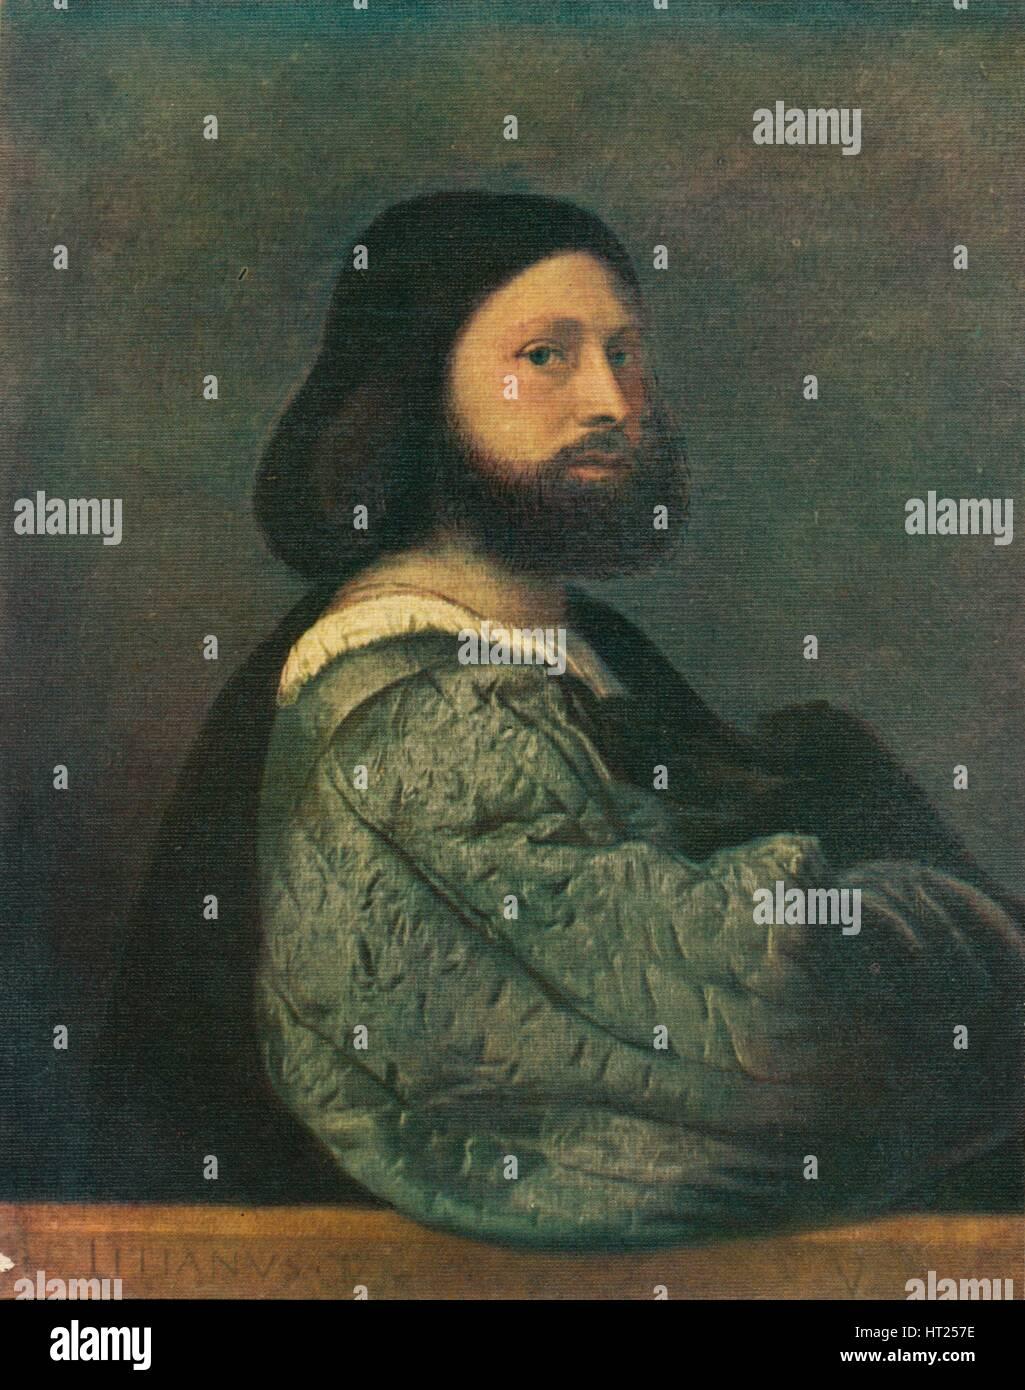 'Portrait of Gerolamo Barbarigo', 1510, (1909). Artist: Titian. - Stock Image